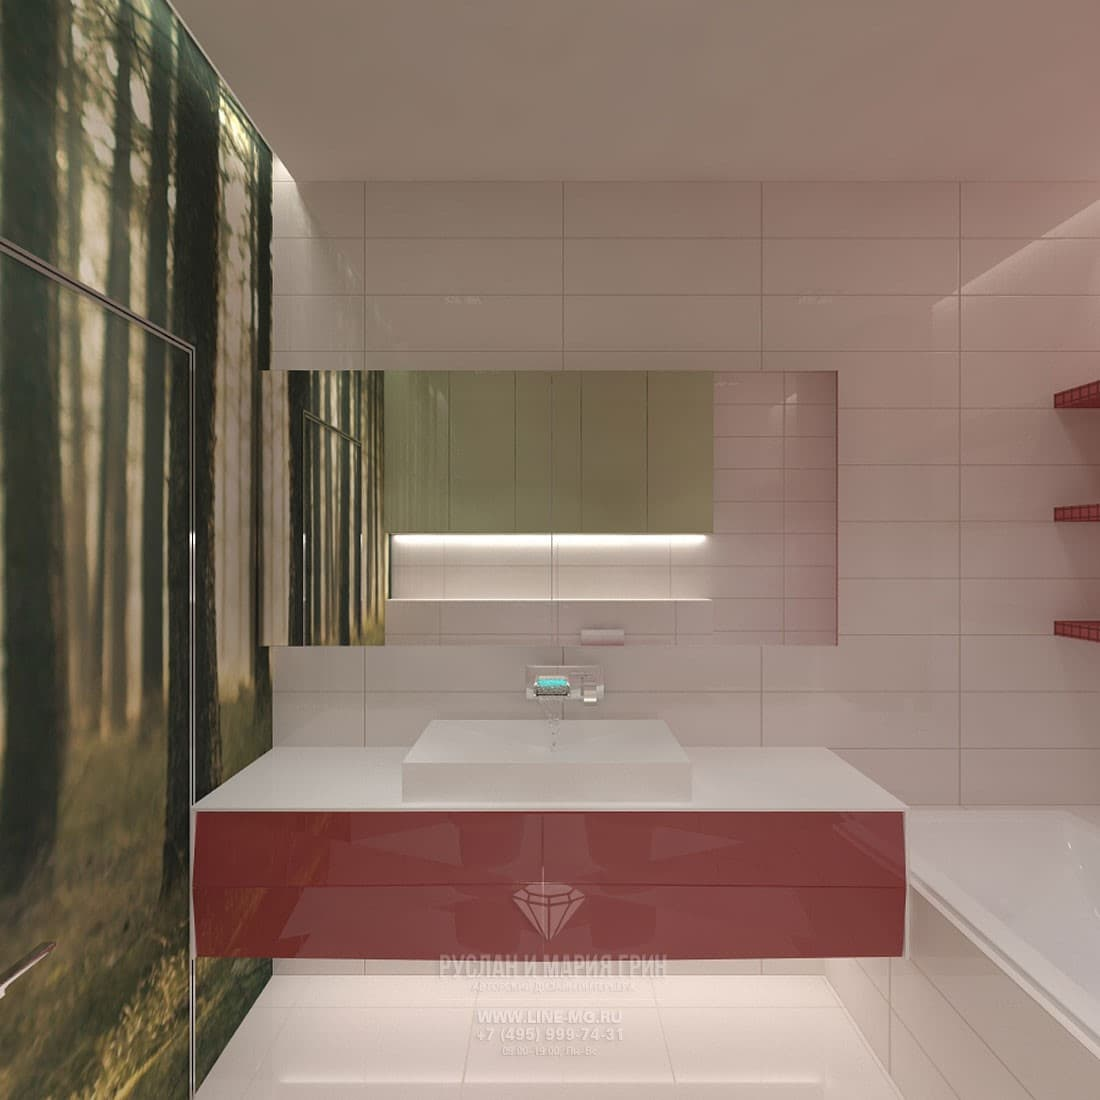 Интерьер ванной комнаты с яркими акцентами